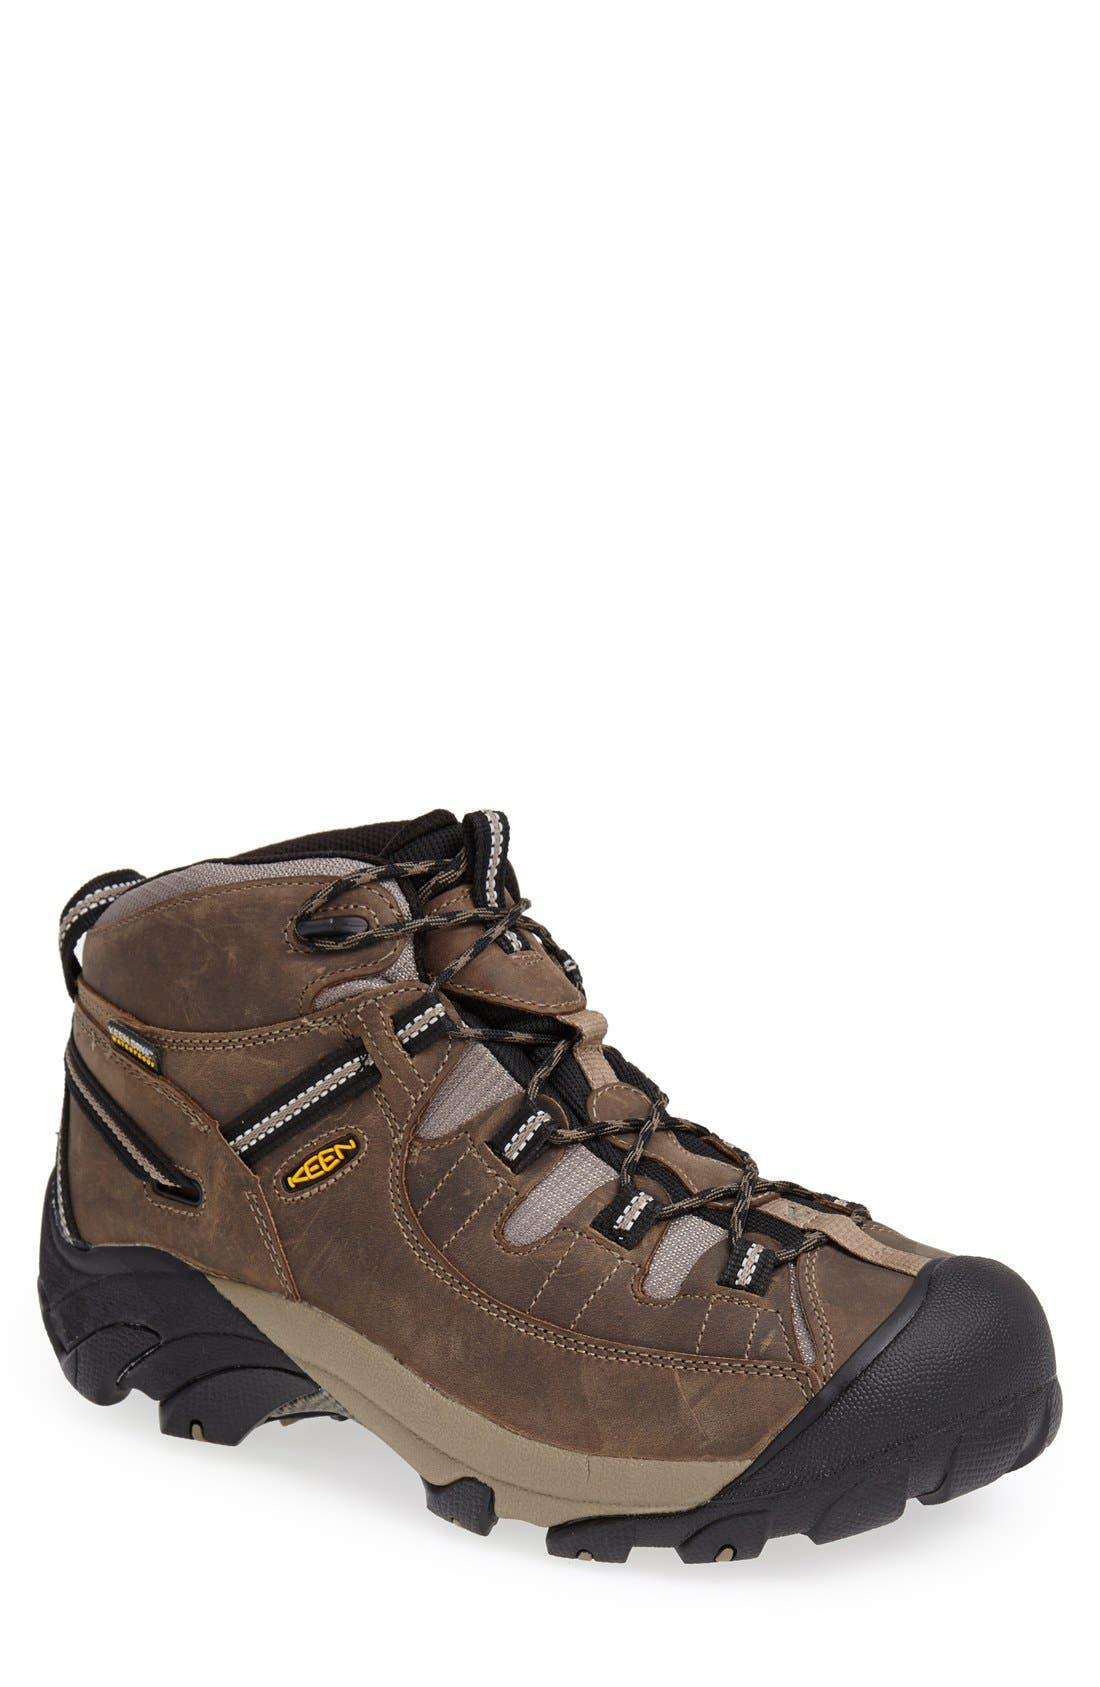 Targhee II Mid Hiking Waterproof Boot,                             Main thumbnail 1, color,                             SHITAKE/ BRINDLE